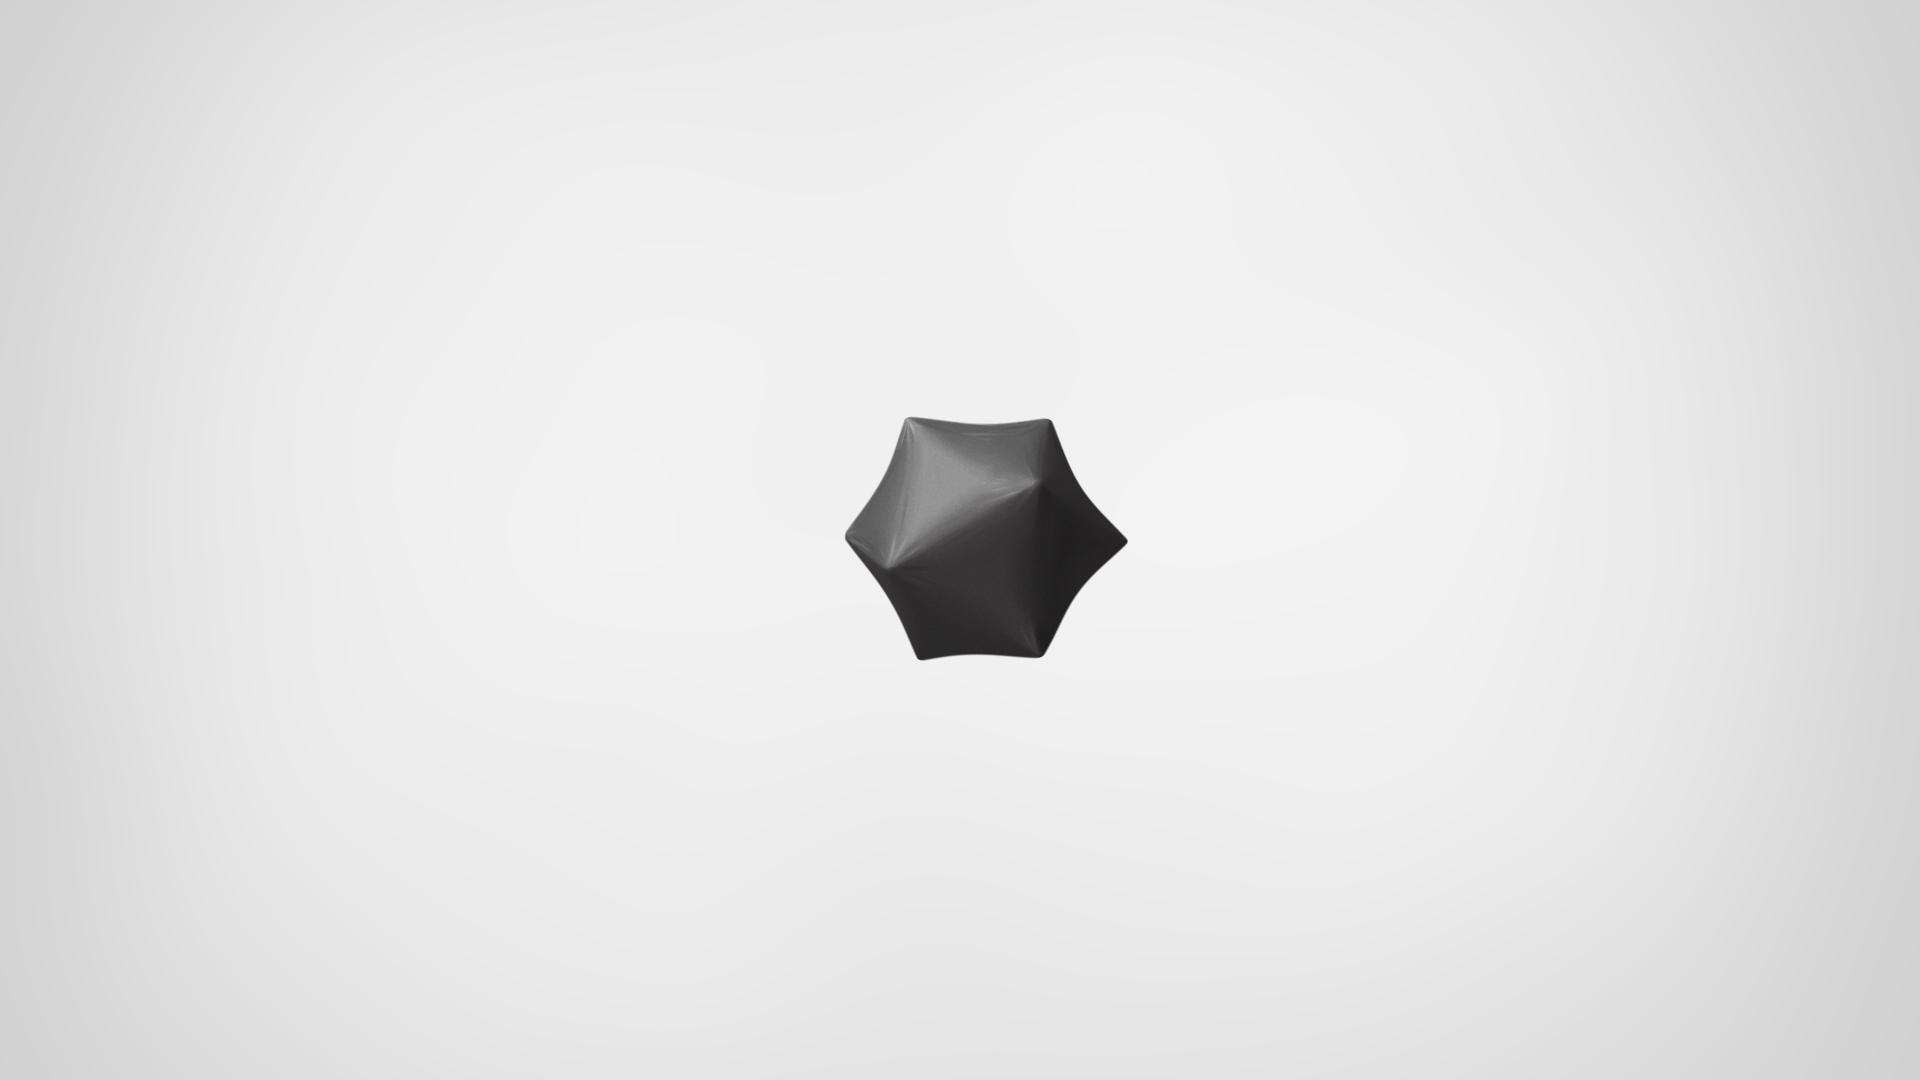 007_geometry.jpg